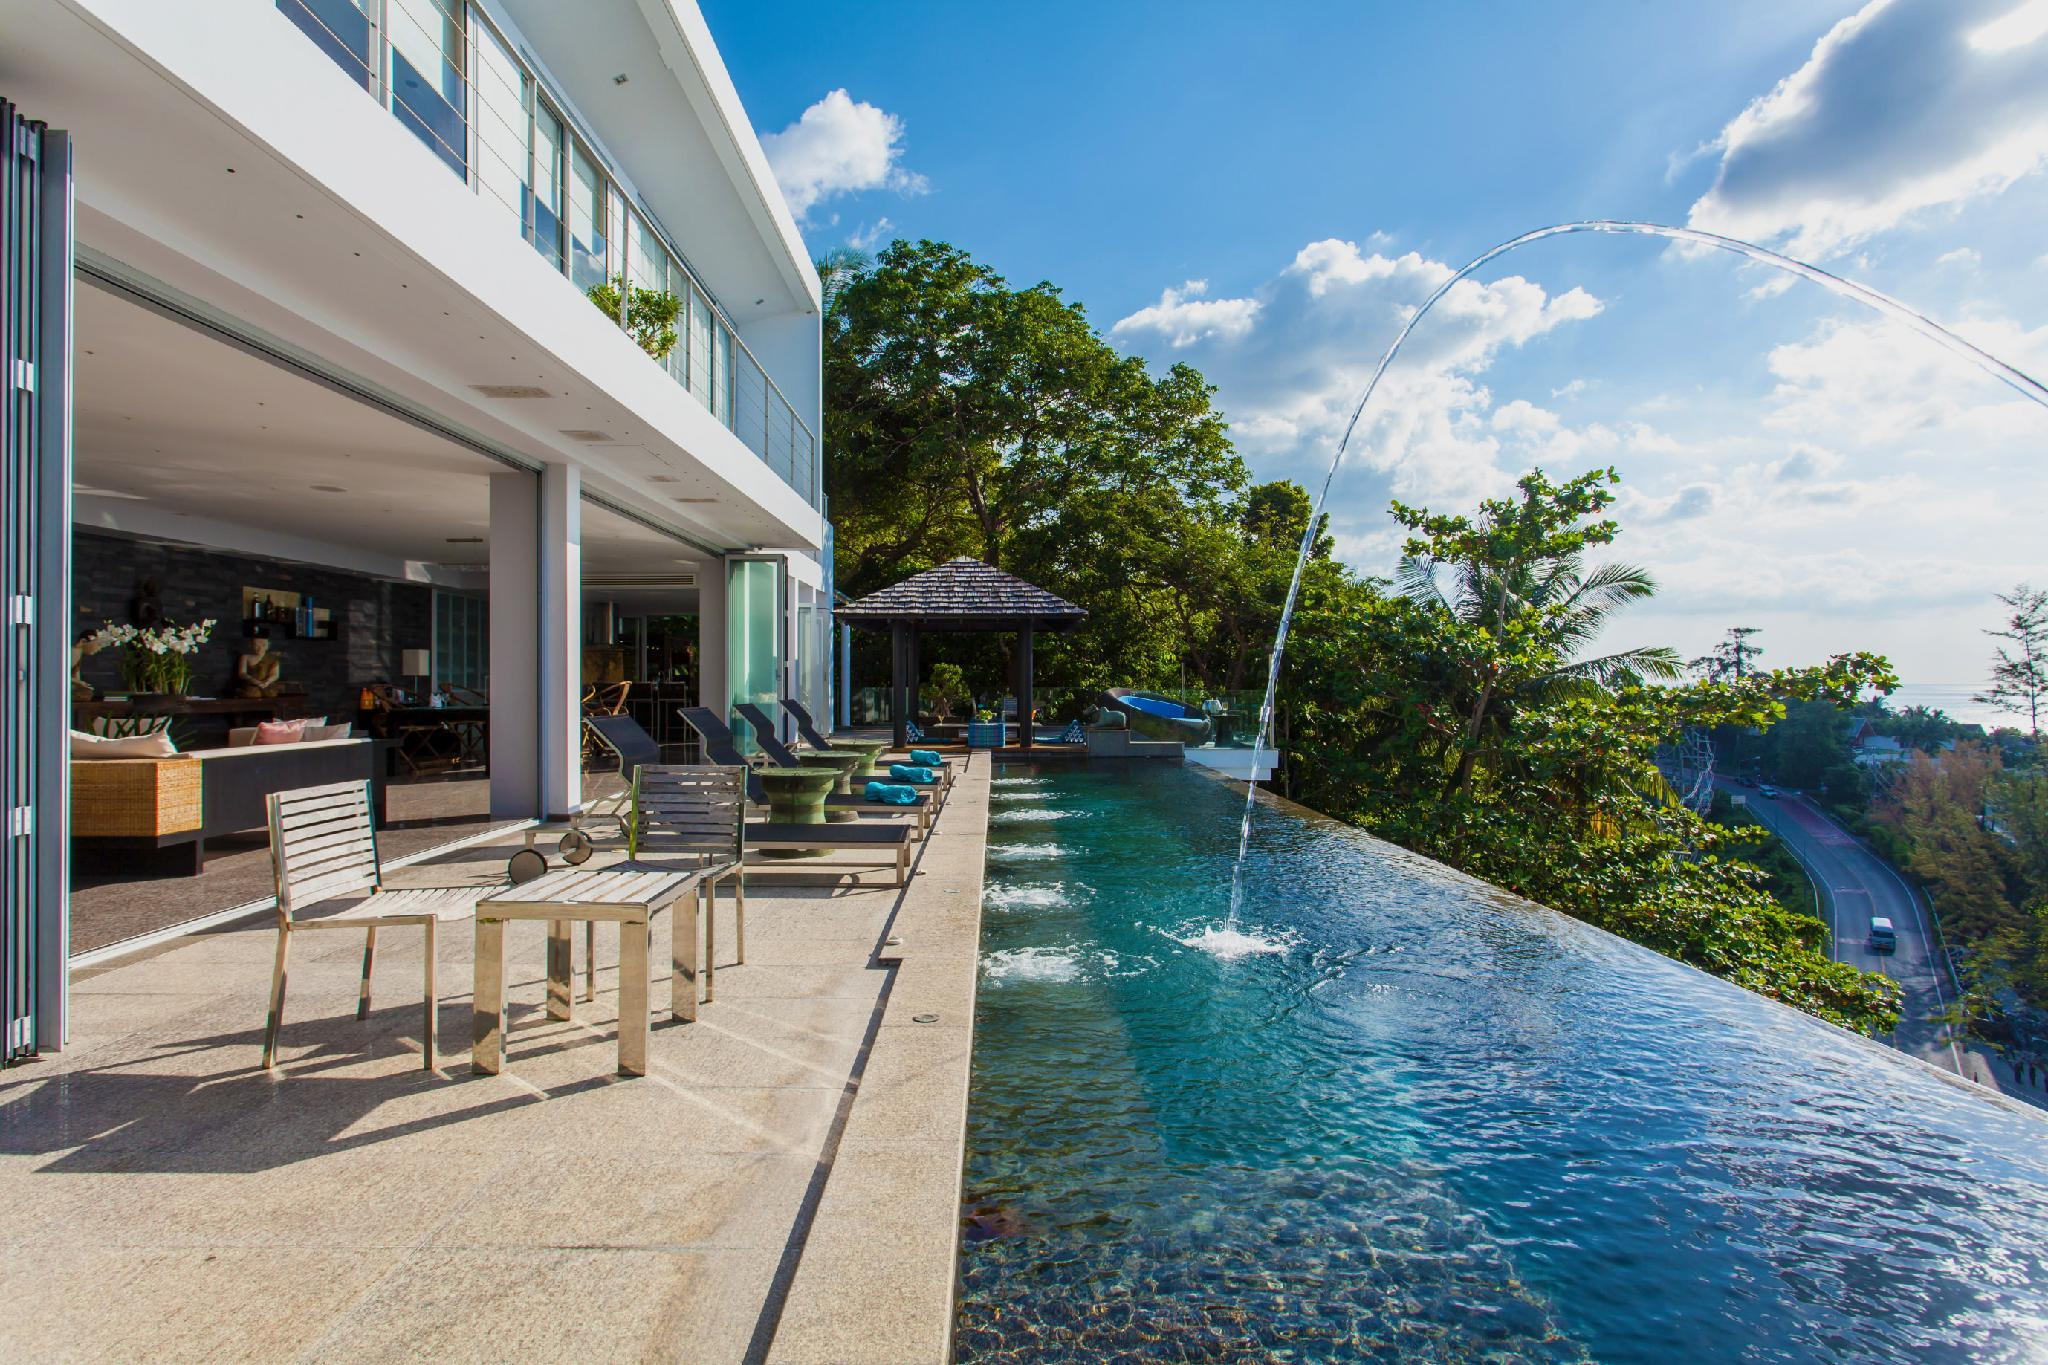 8 Bedroom Surin Beach Villa